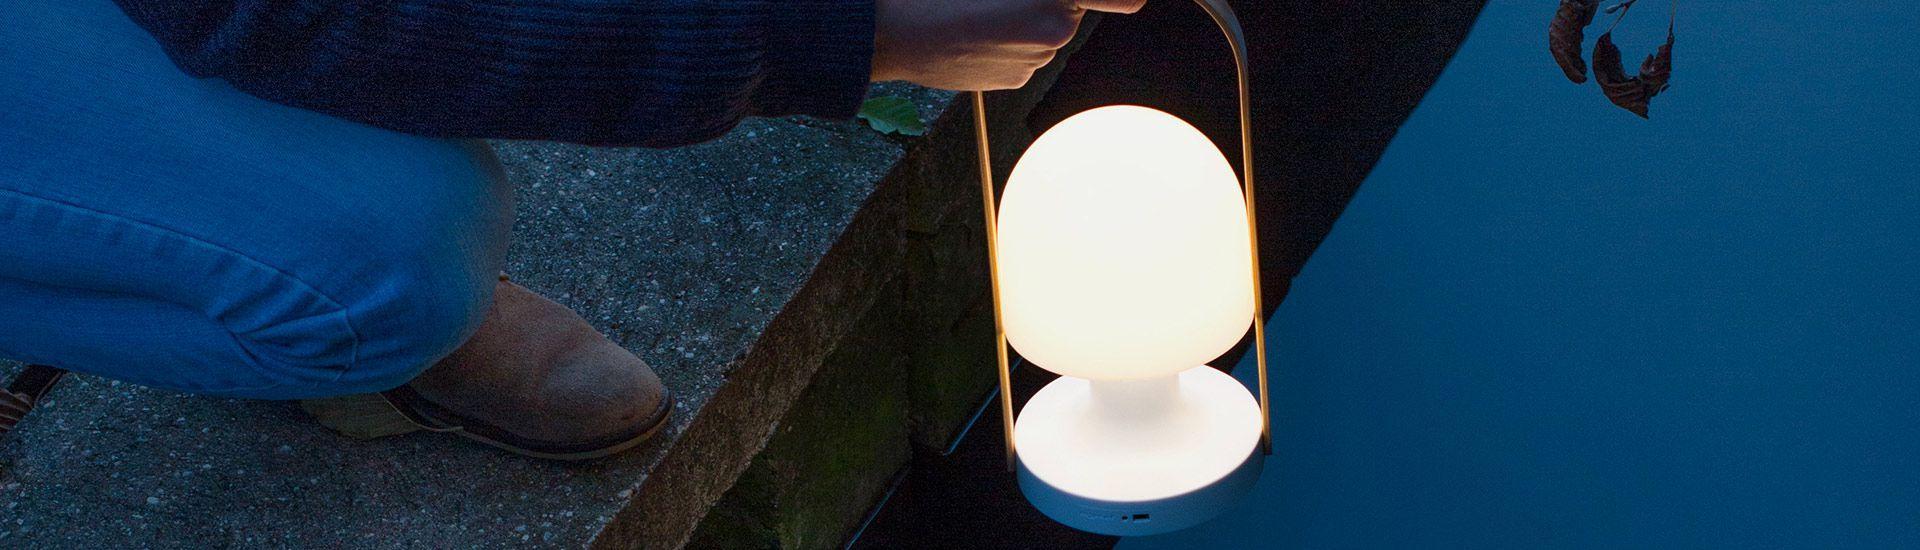 Santorini Lâmpada pingente E27 LED Classic 8W branco